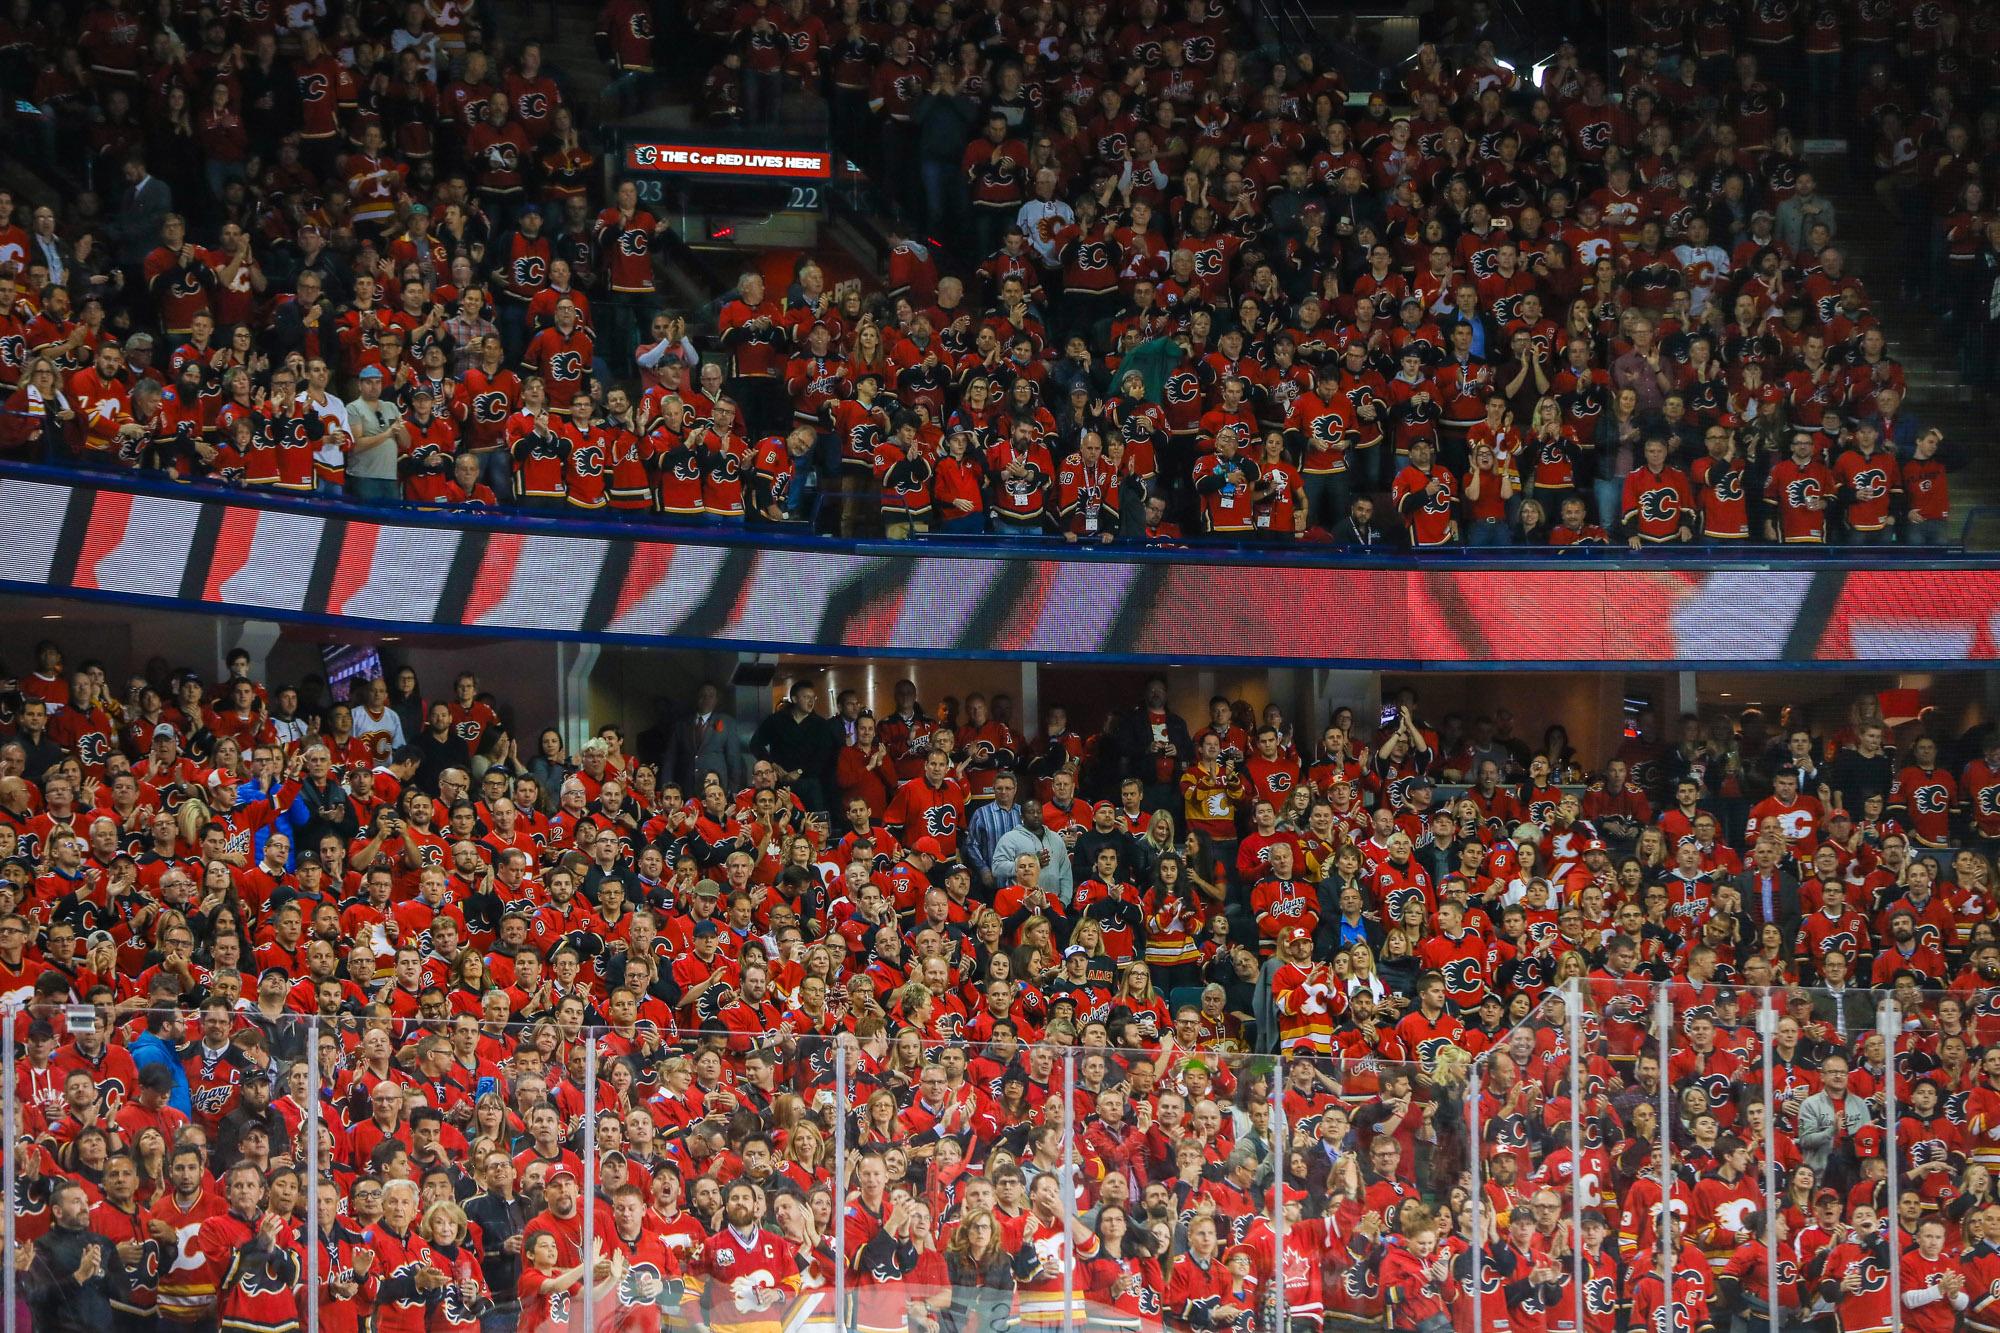 10021716-nhl-stanley-cup-playoffs-anaheim-ducks-at-calgary-flames